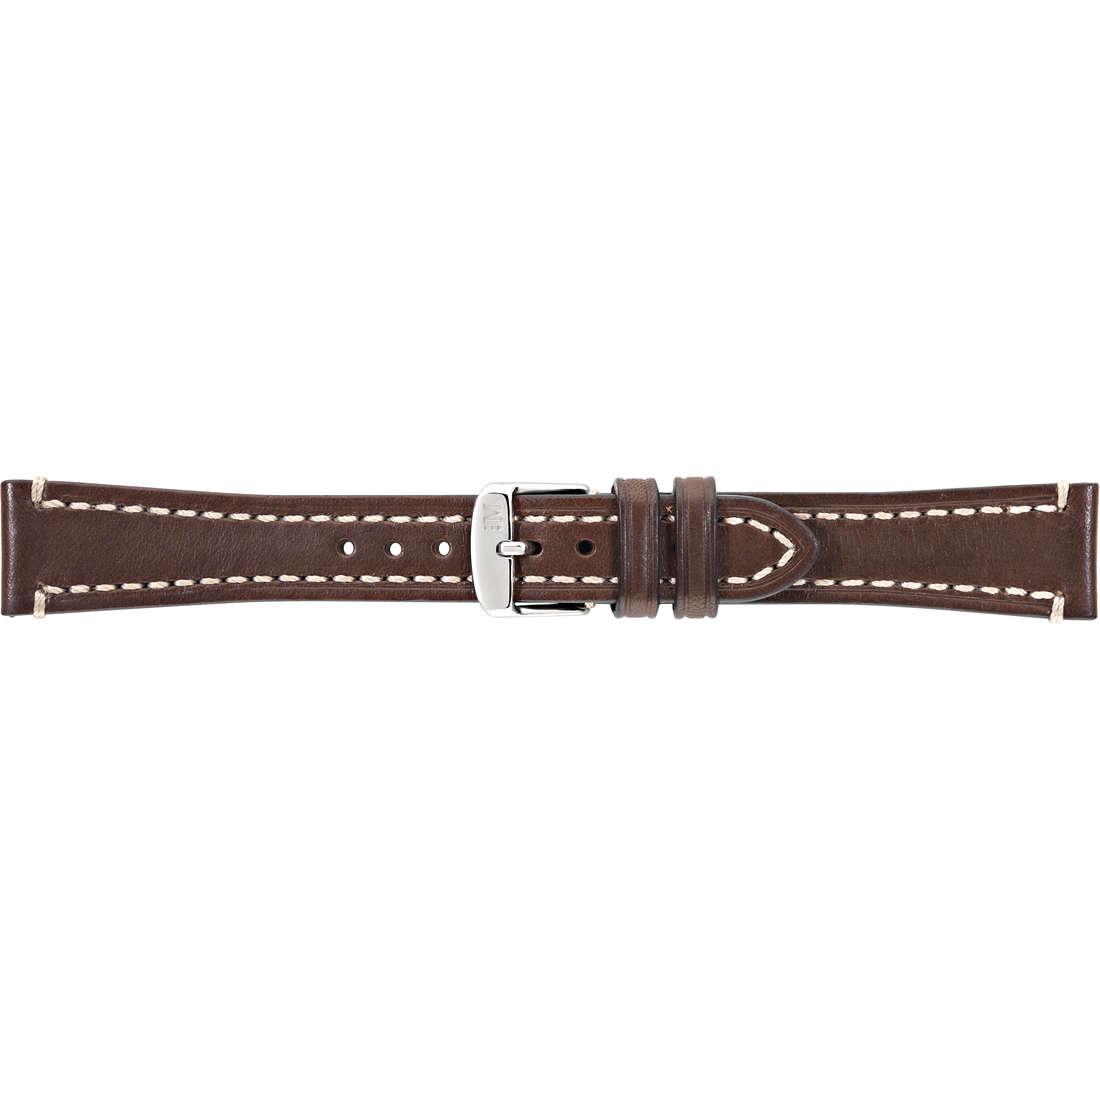 watch watch bands watch straps man Morellato Manufatti A01X4539B51032CR20